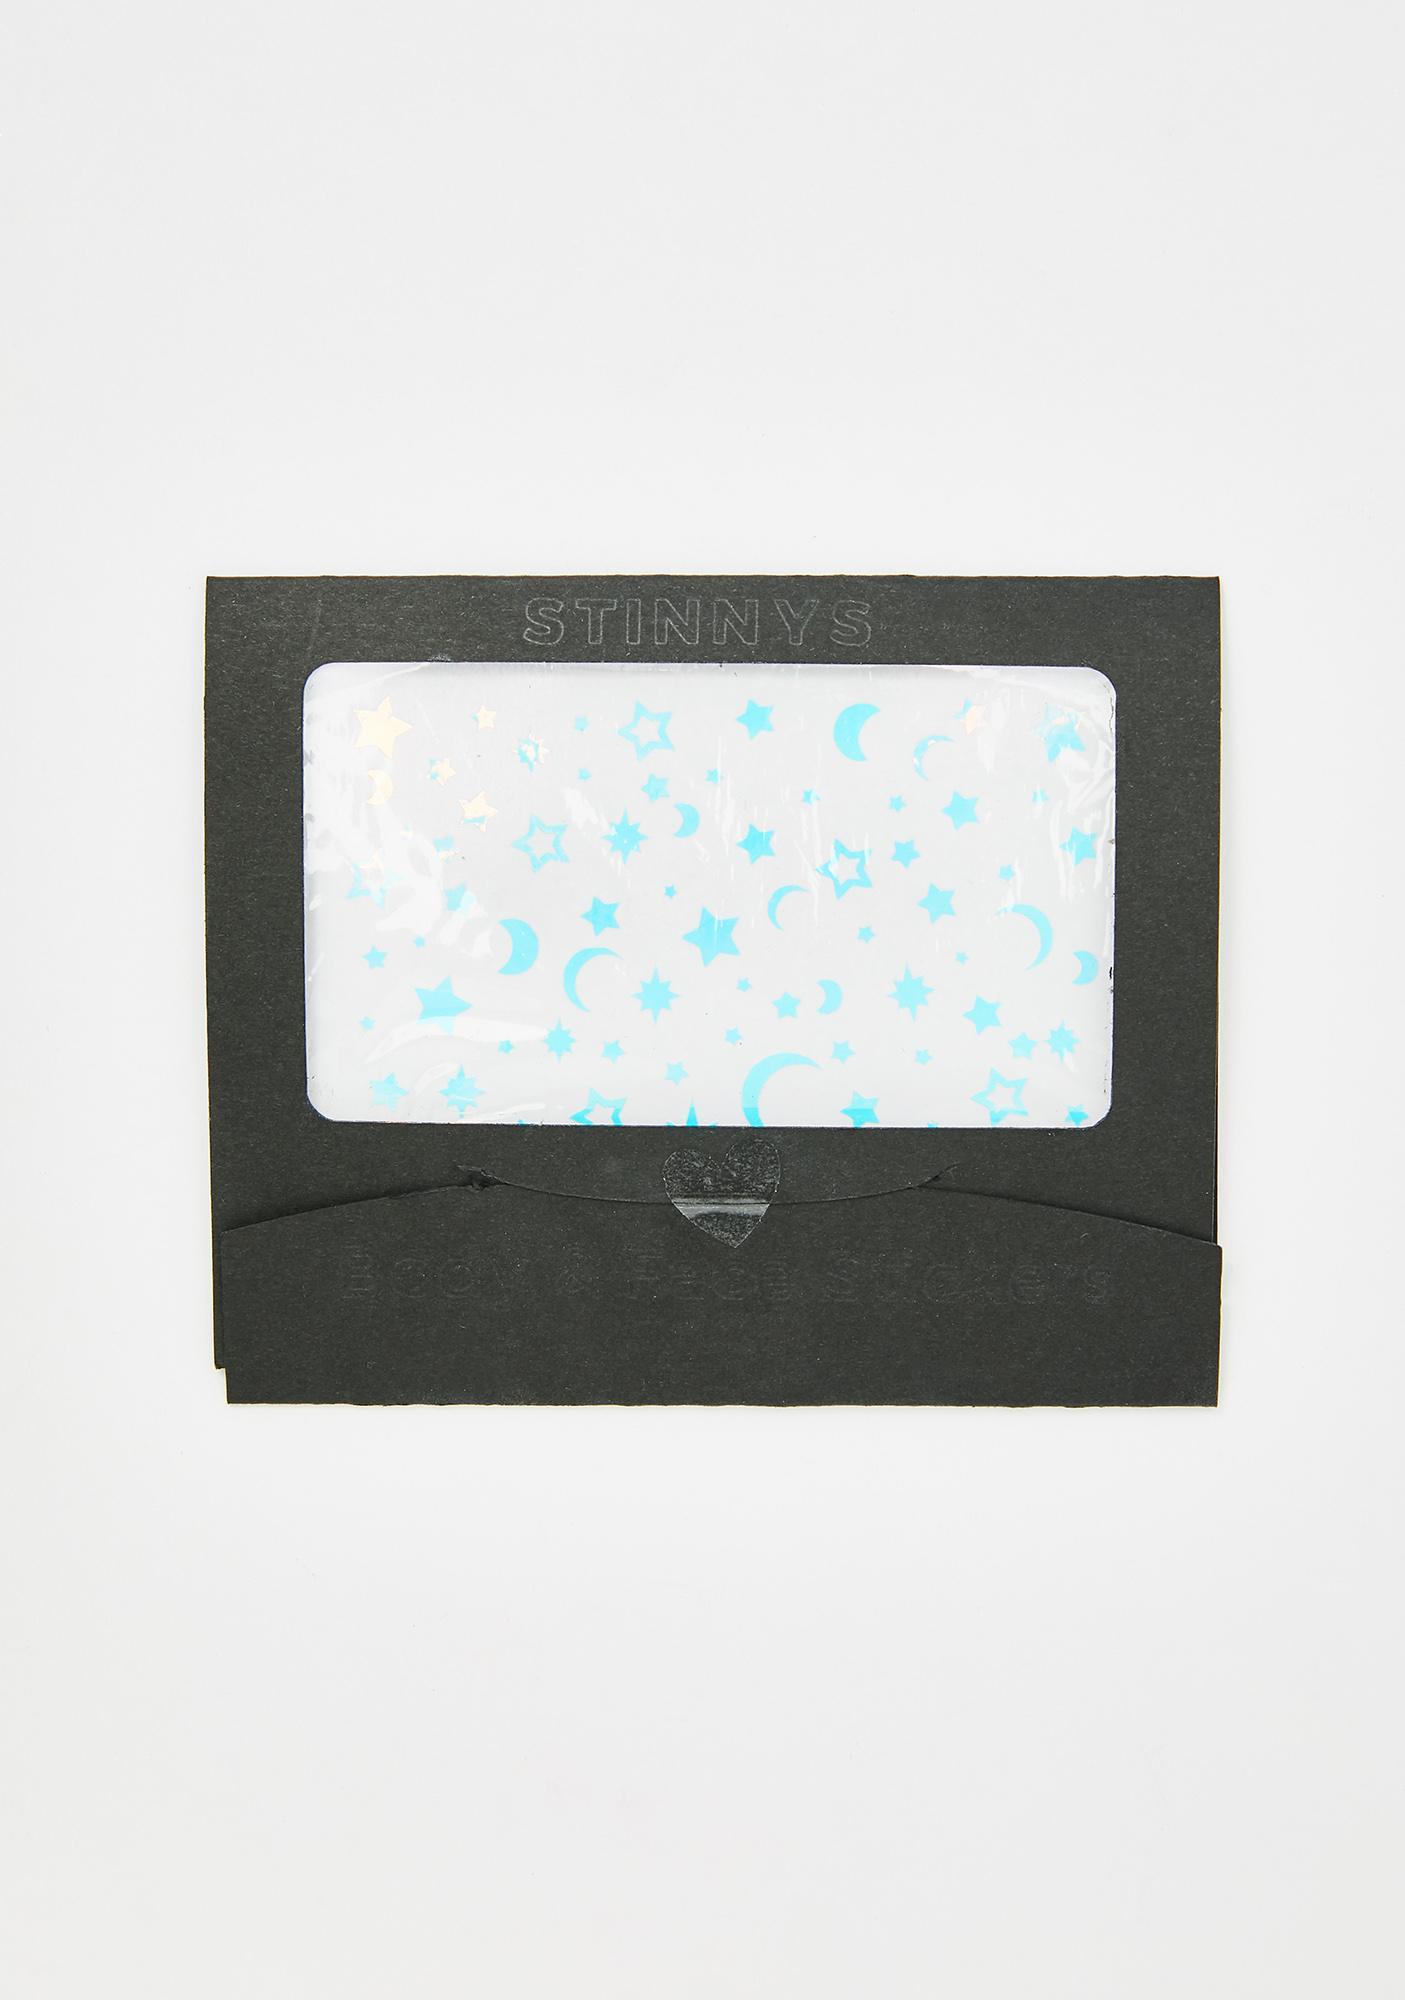 Stinnys Star Lit Nights Body N' Face Stickers